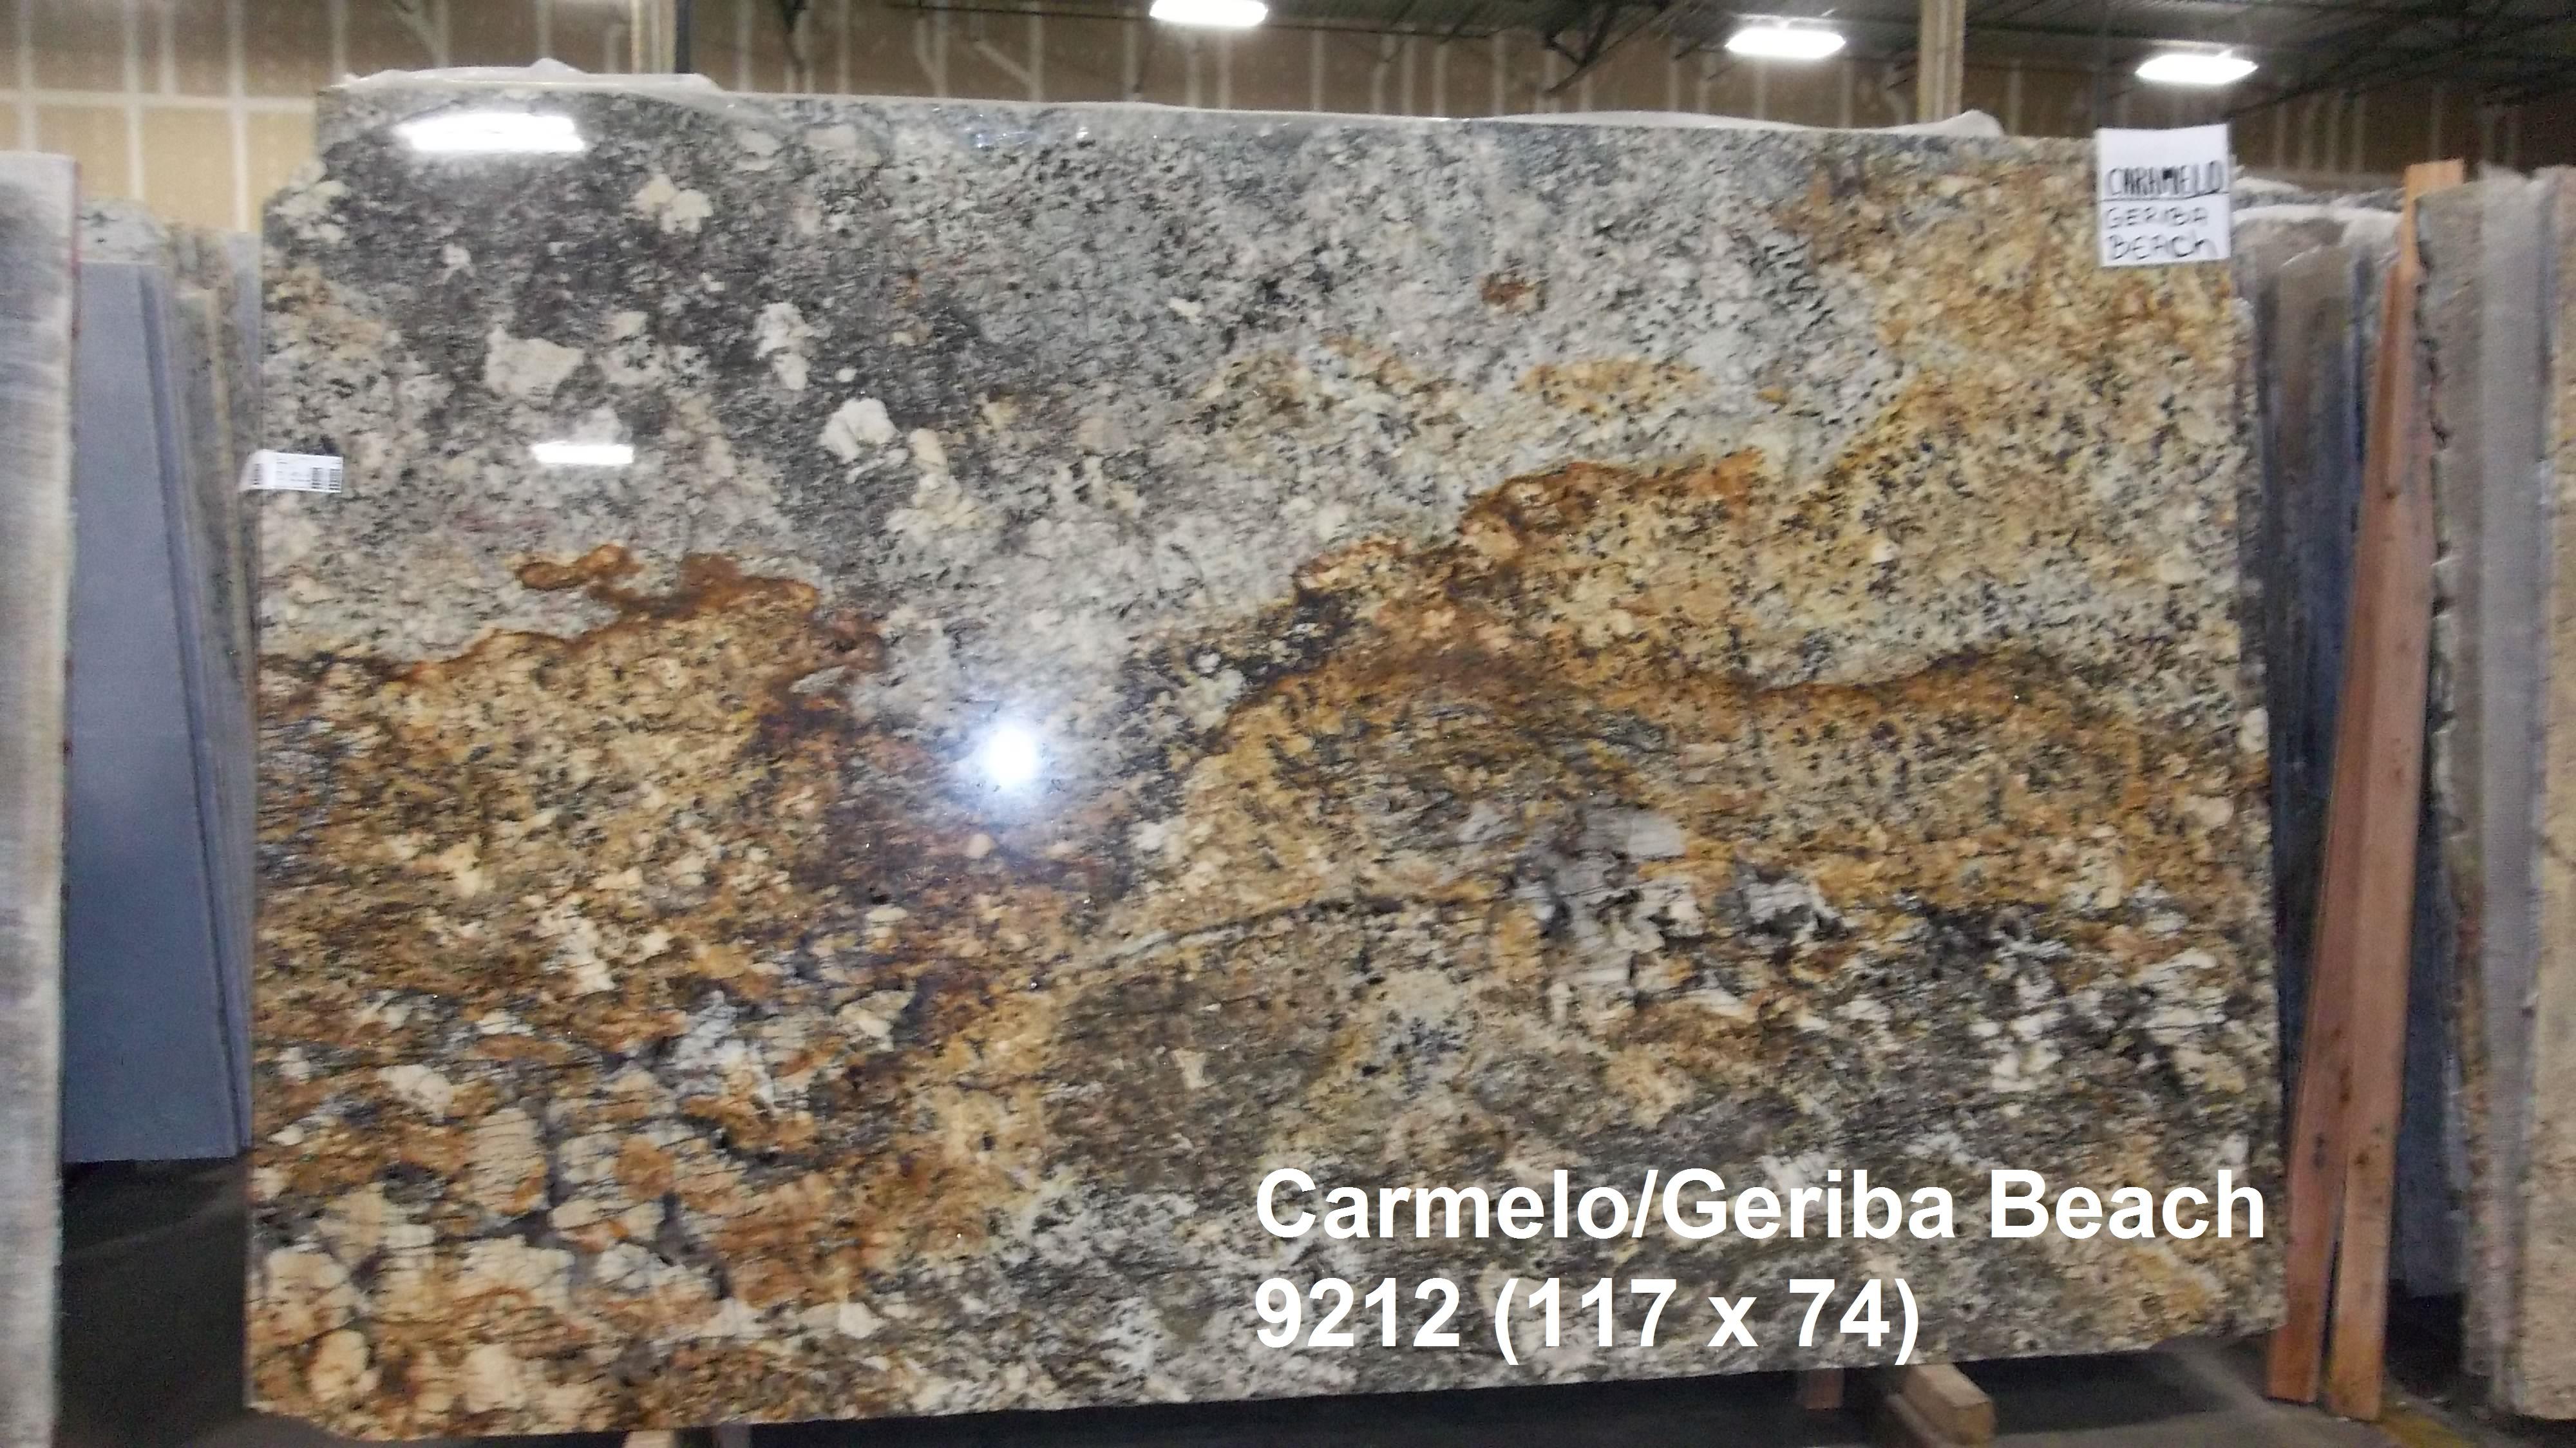 countertops spokane work washington of construction samples cha d mac granite